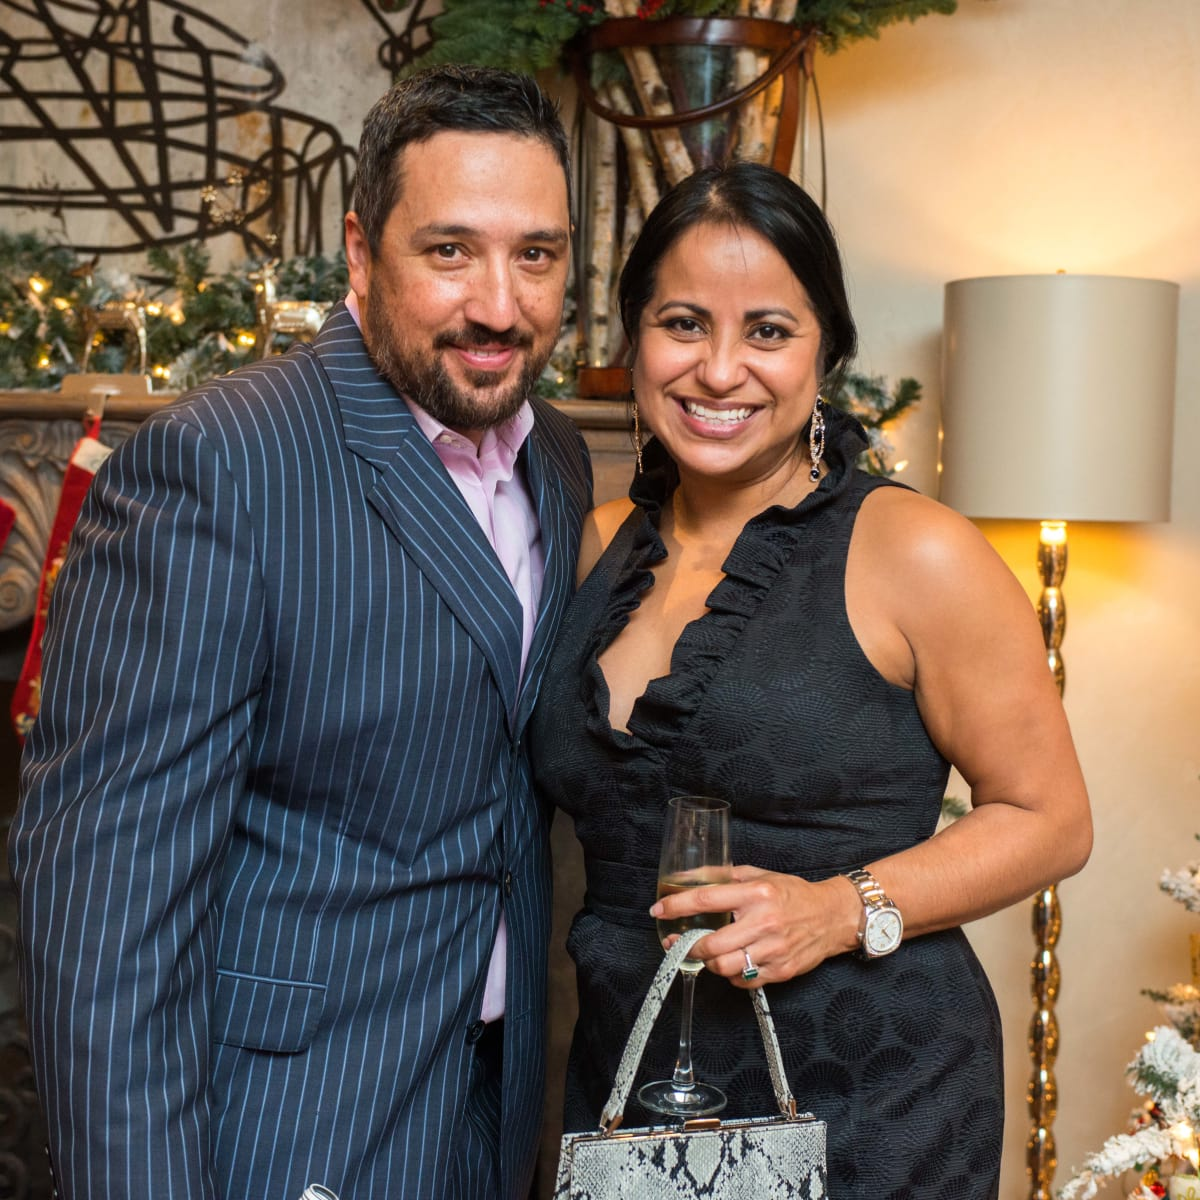 News, MD Anderson Santa's Elves, Dec. 2015, Rick DeToto, Jaime Reyna